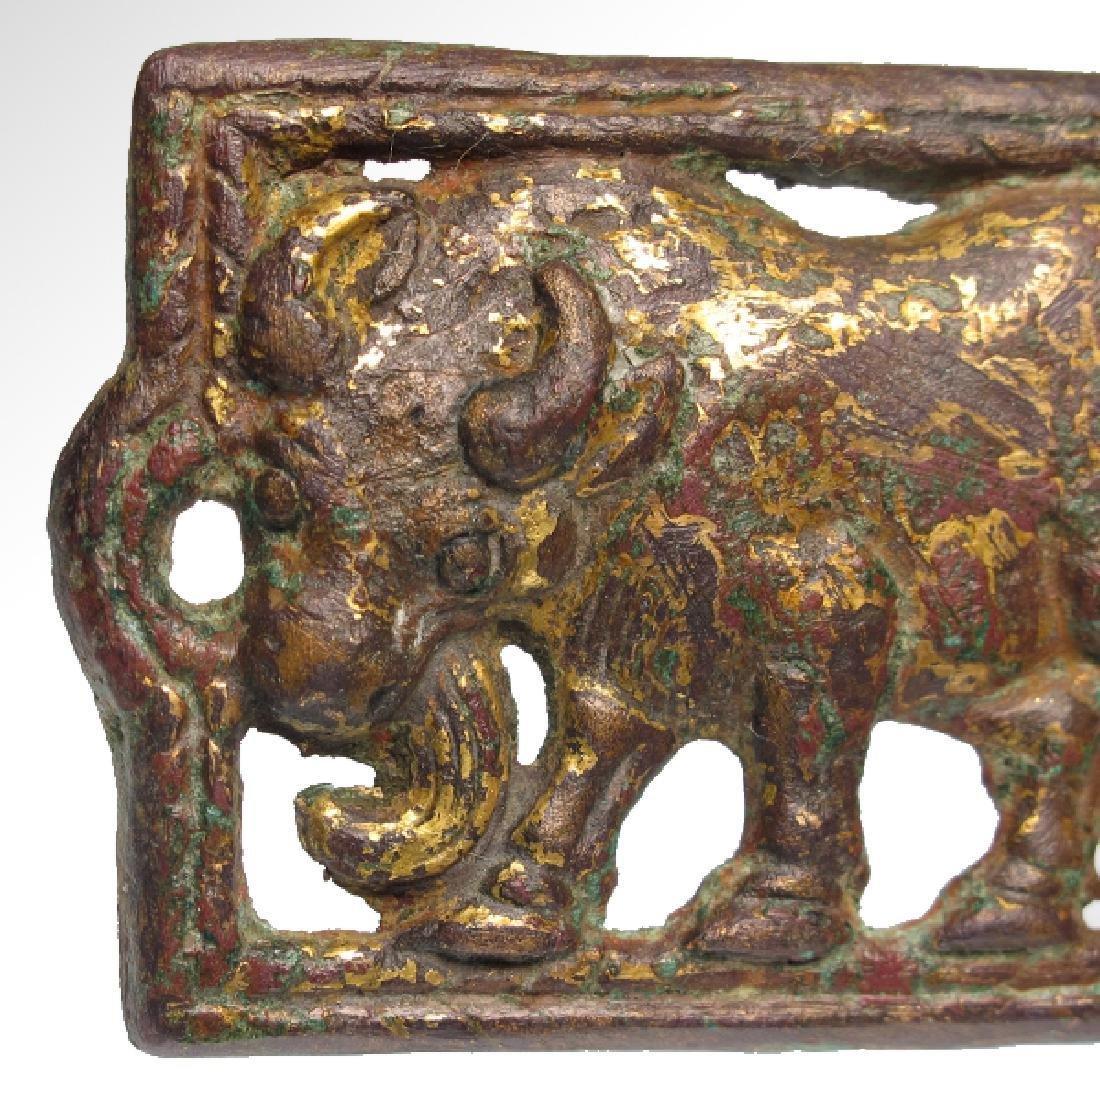 Ordos Gilt Bronze Open-Work Plaque with Bull, c. 500 - 3